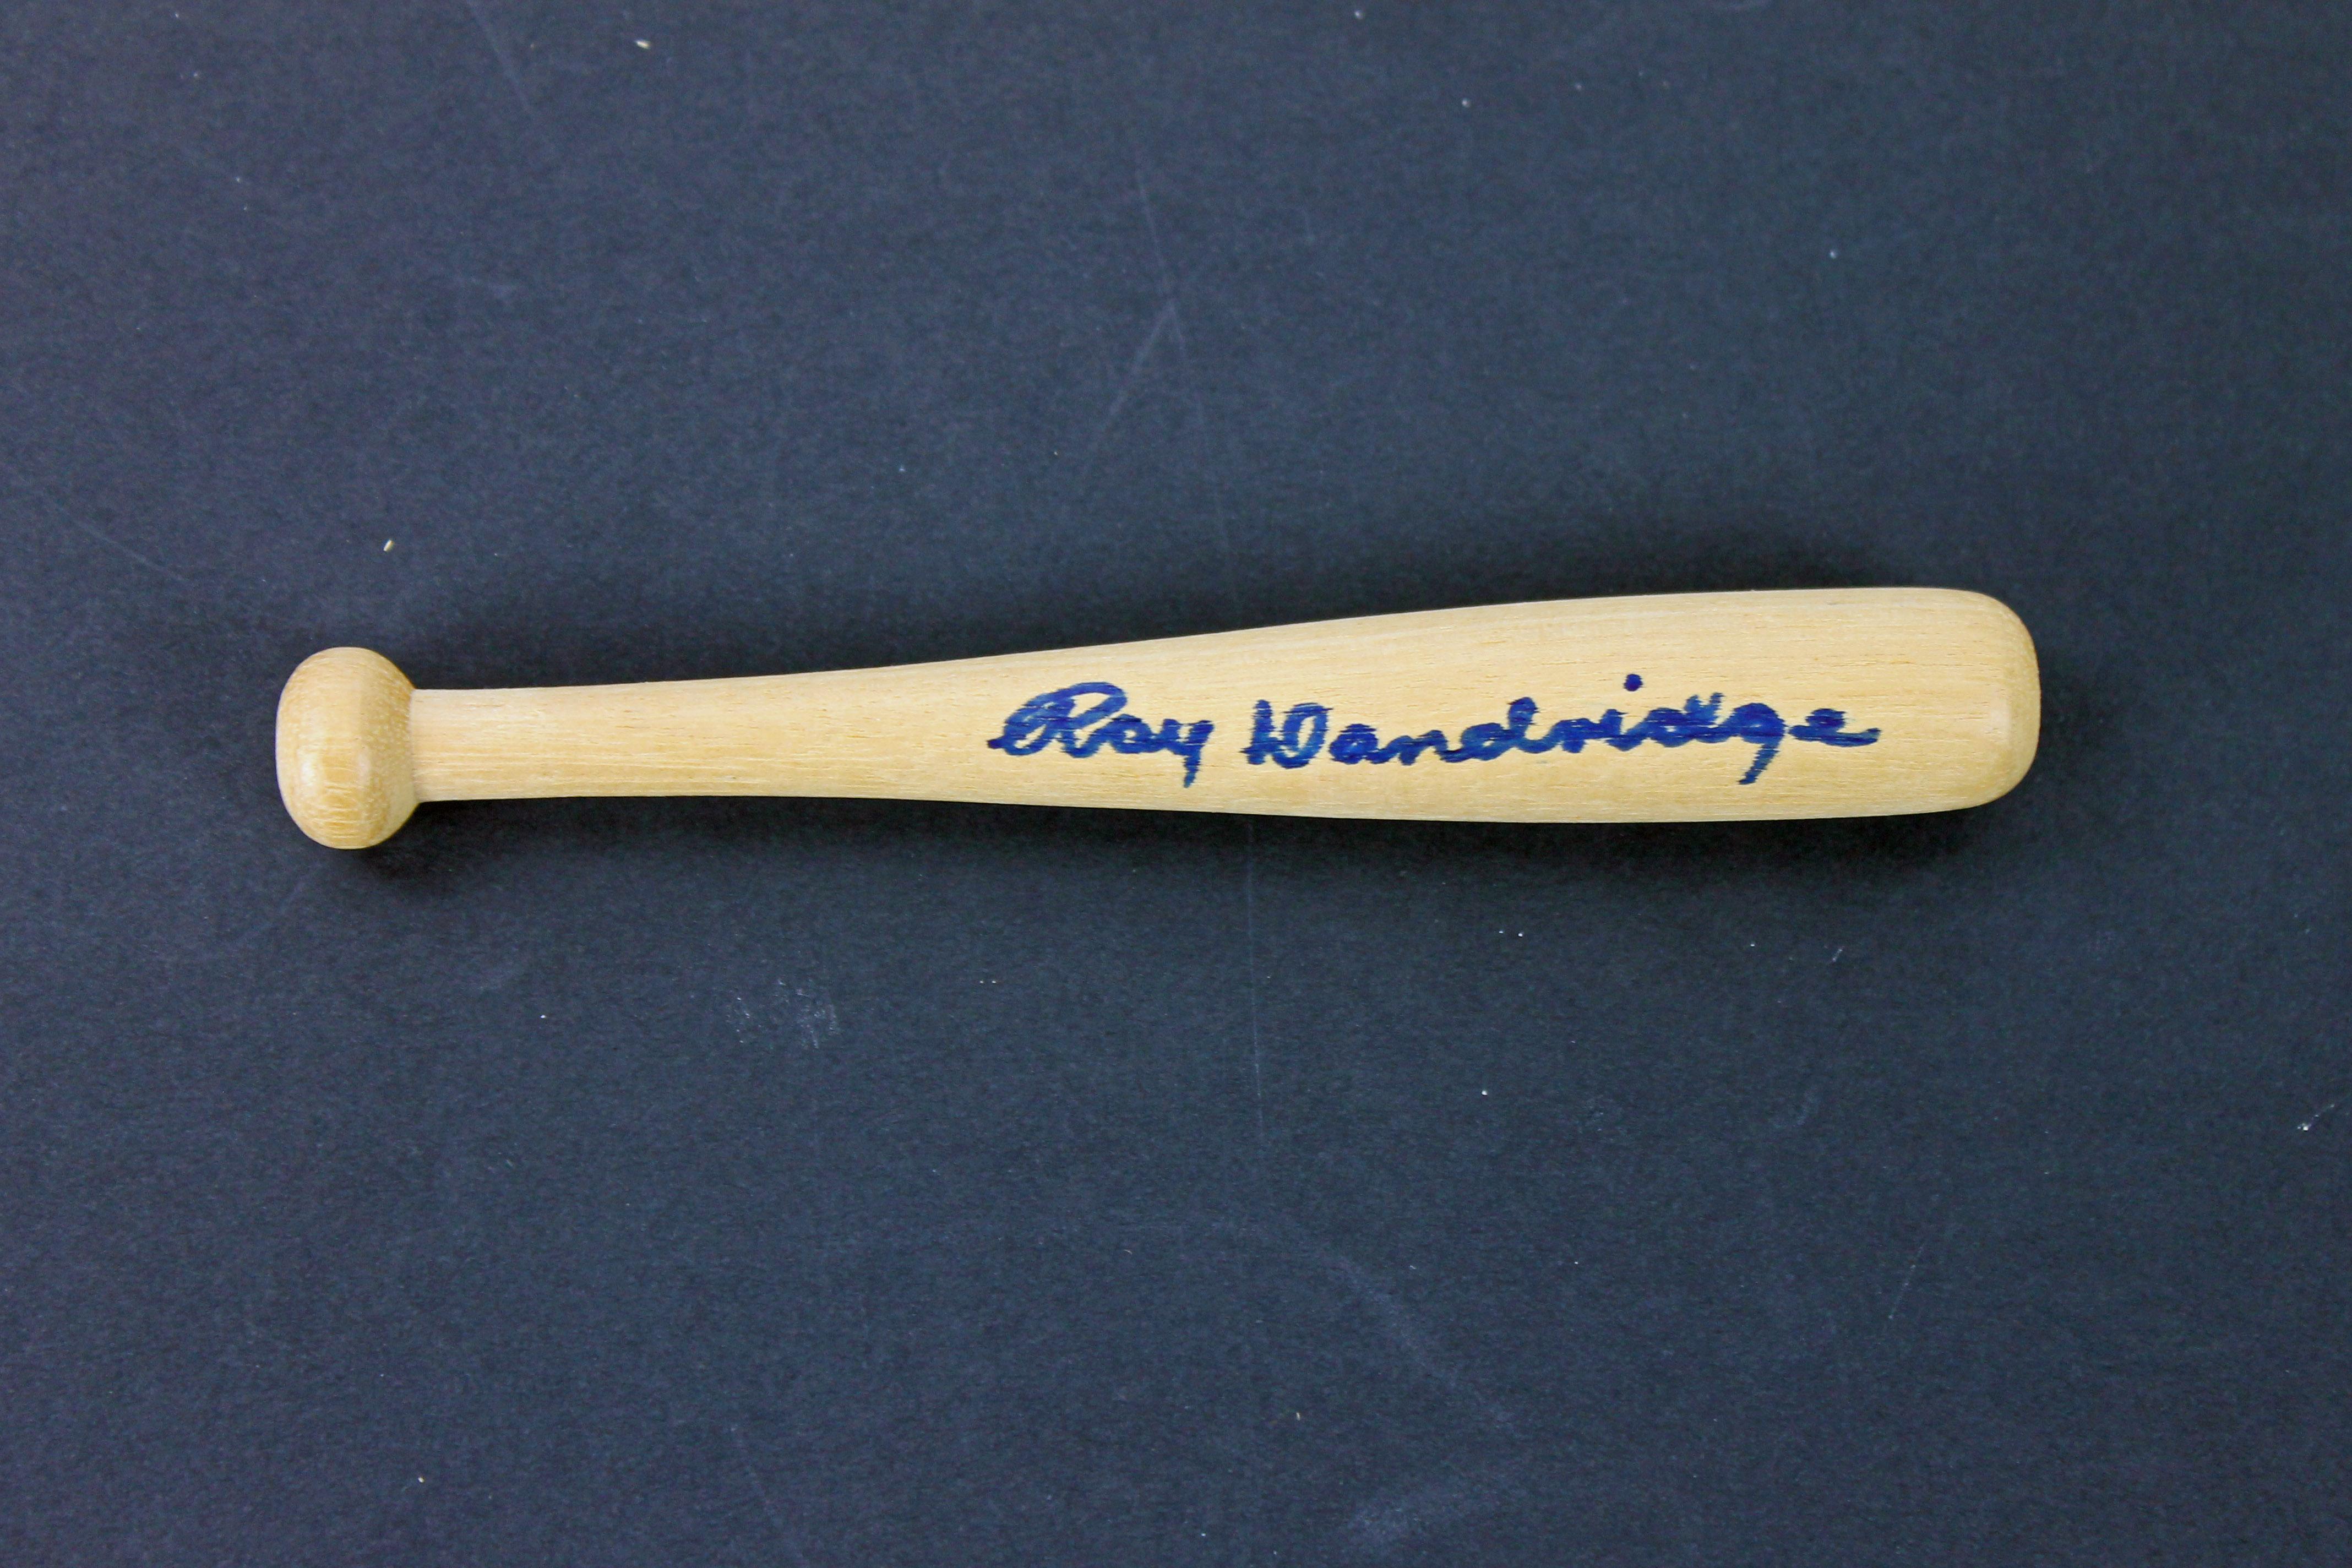 Ray Dandridge Authentic Signed 6 Inch Mini Baseball Bat PSA/DNA #AA43809